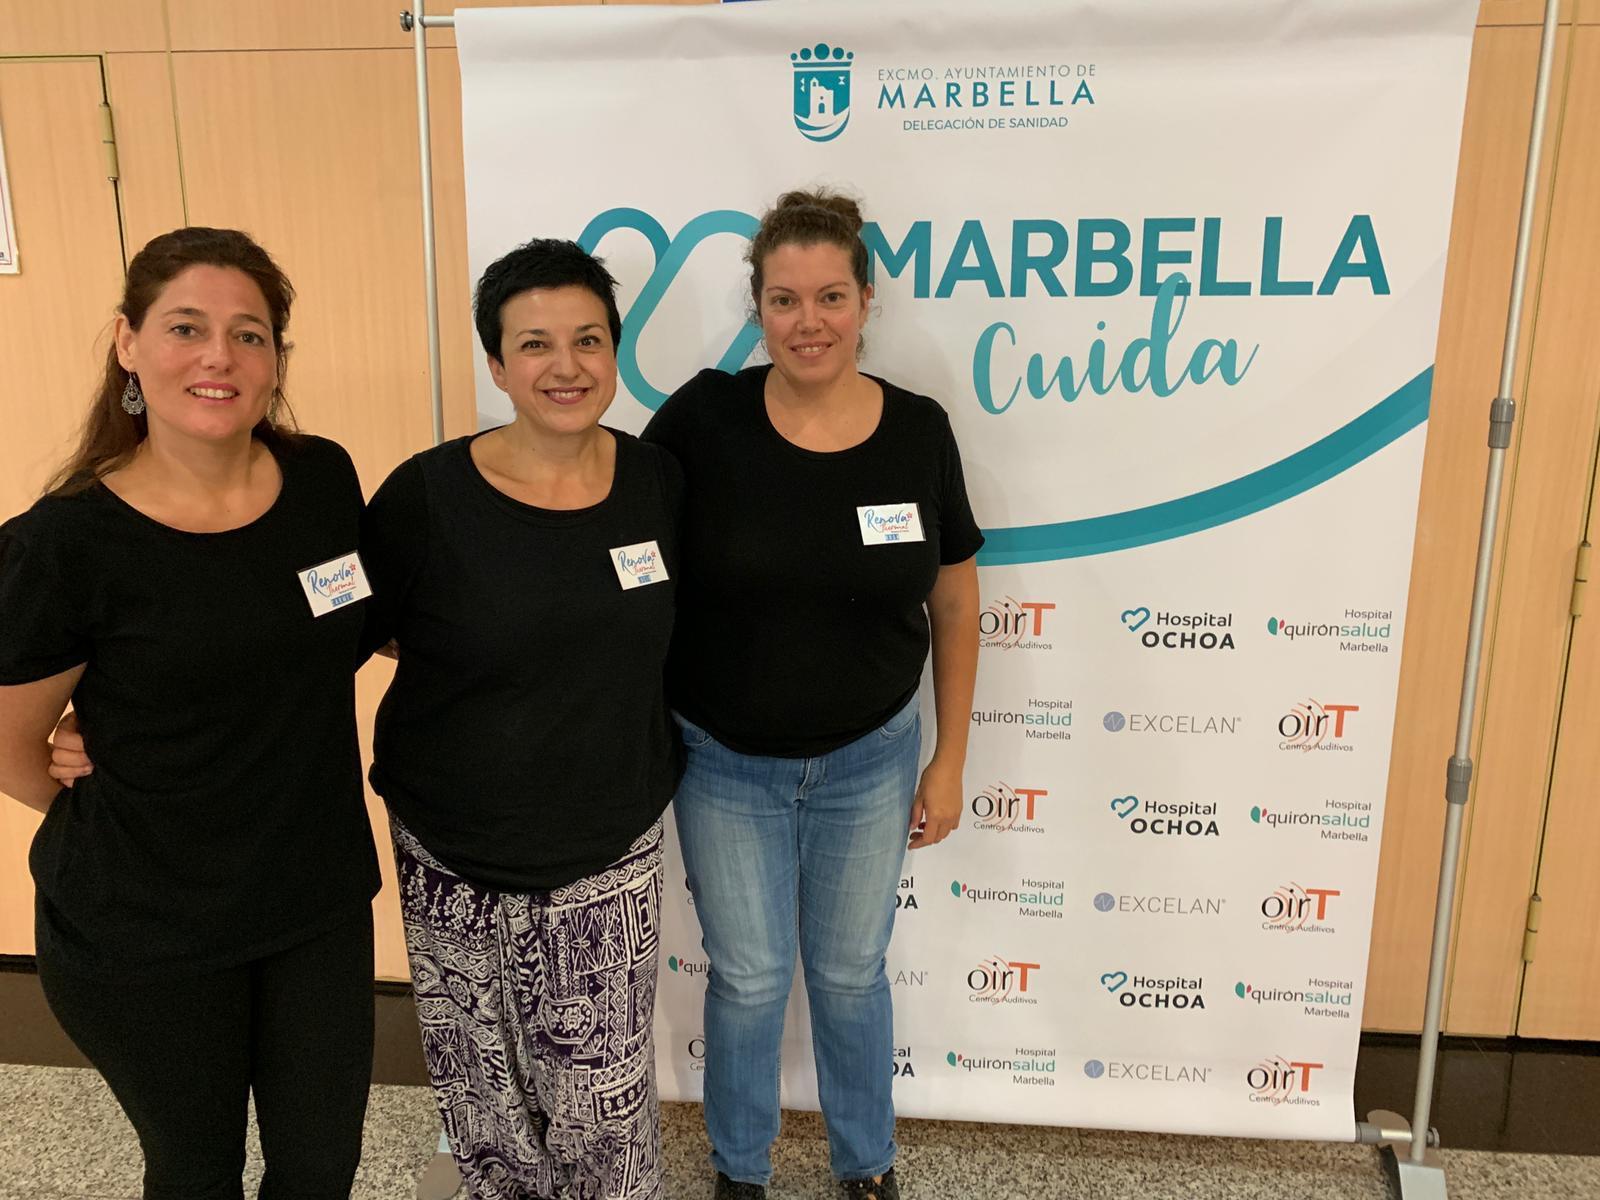 Corner_masajes_Marbella_Cuida_renova_thermal